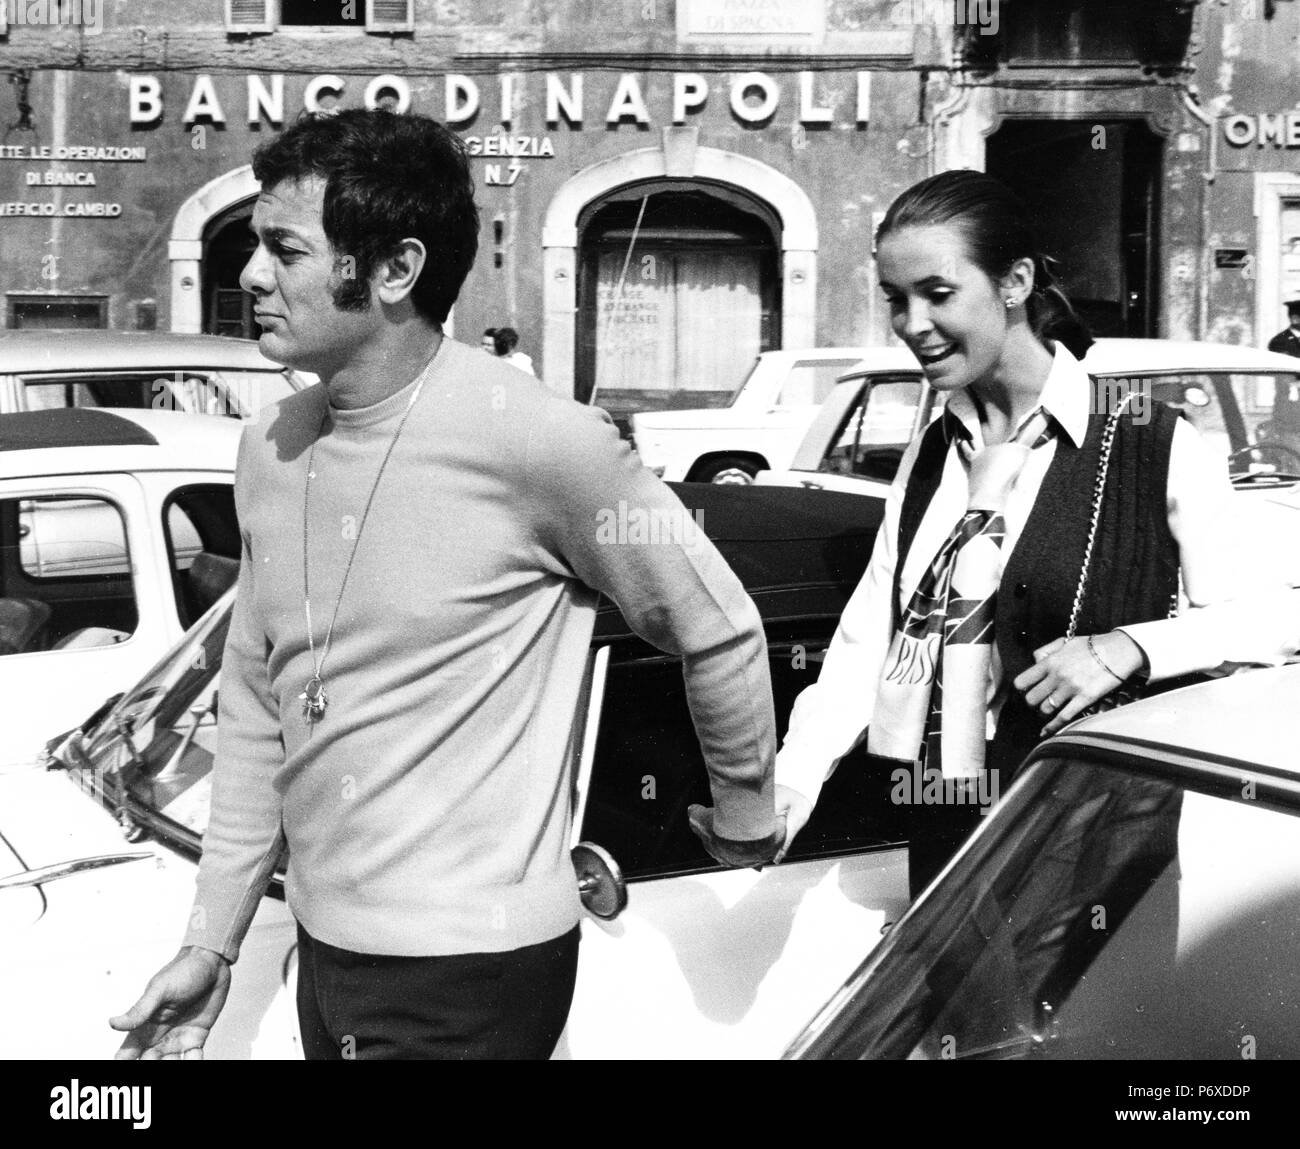 tony curtis, leslie allen, rome 1968 - Stock Image